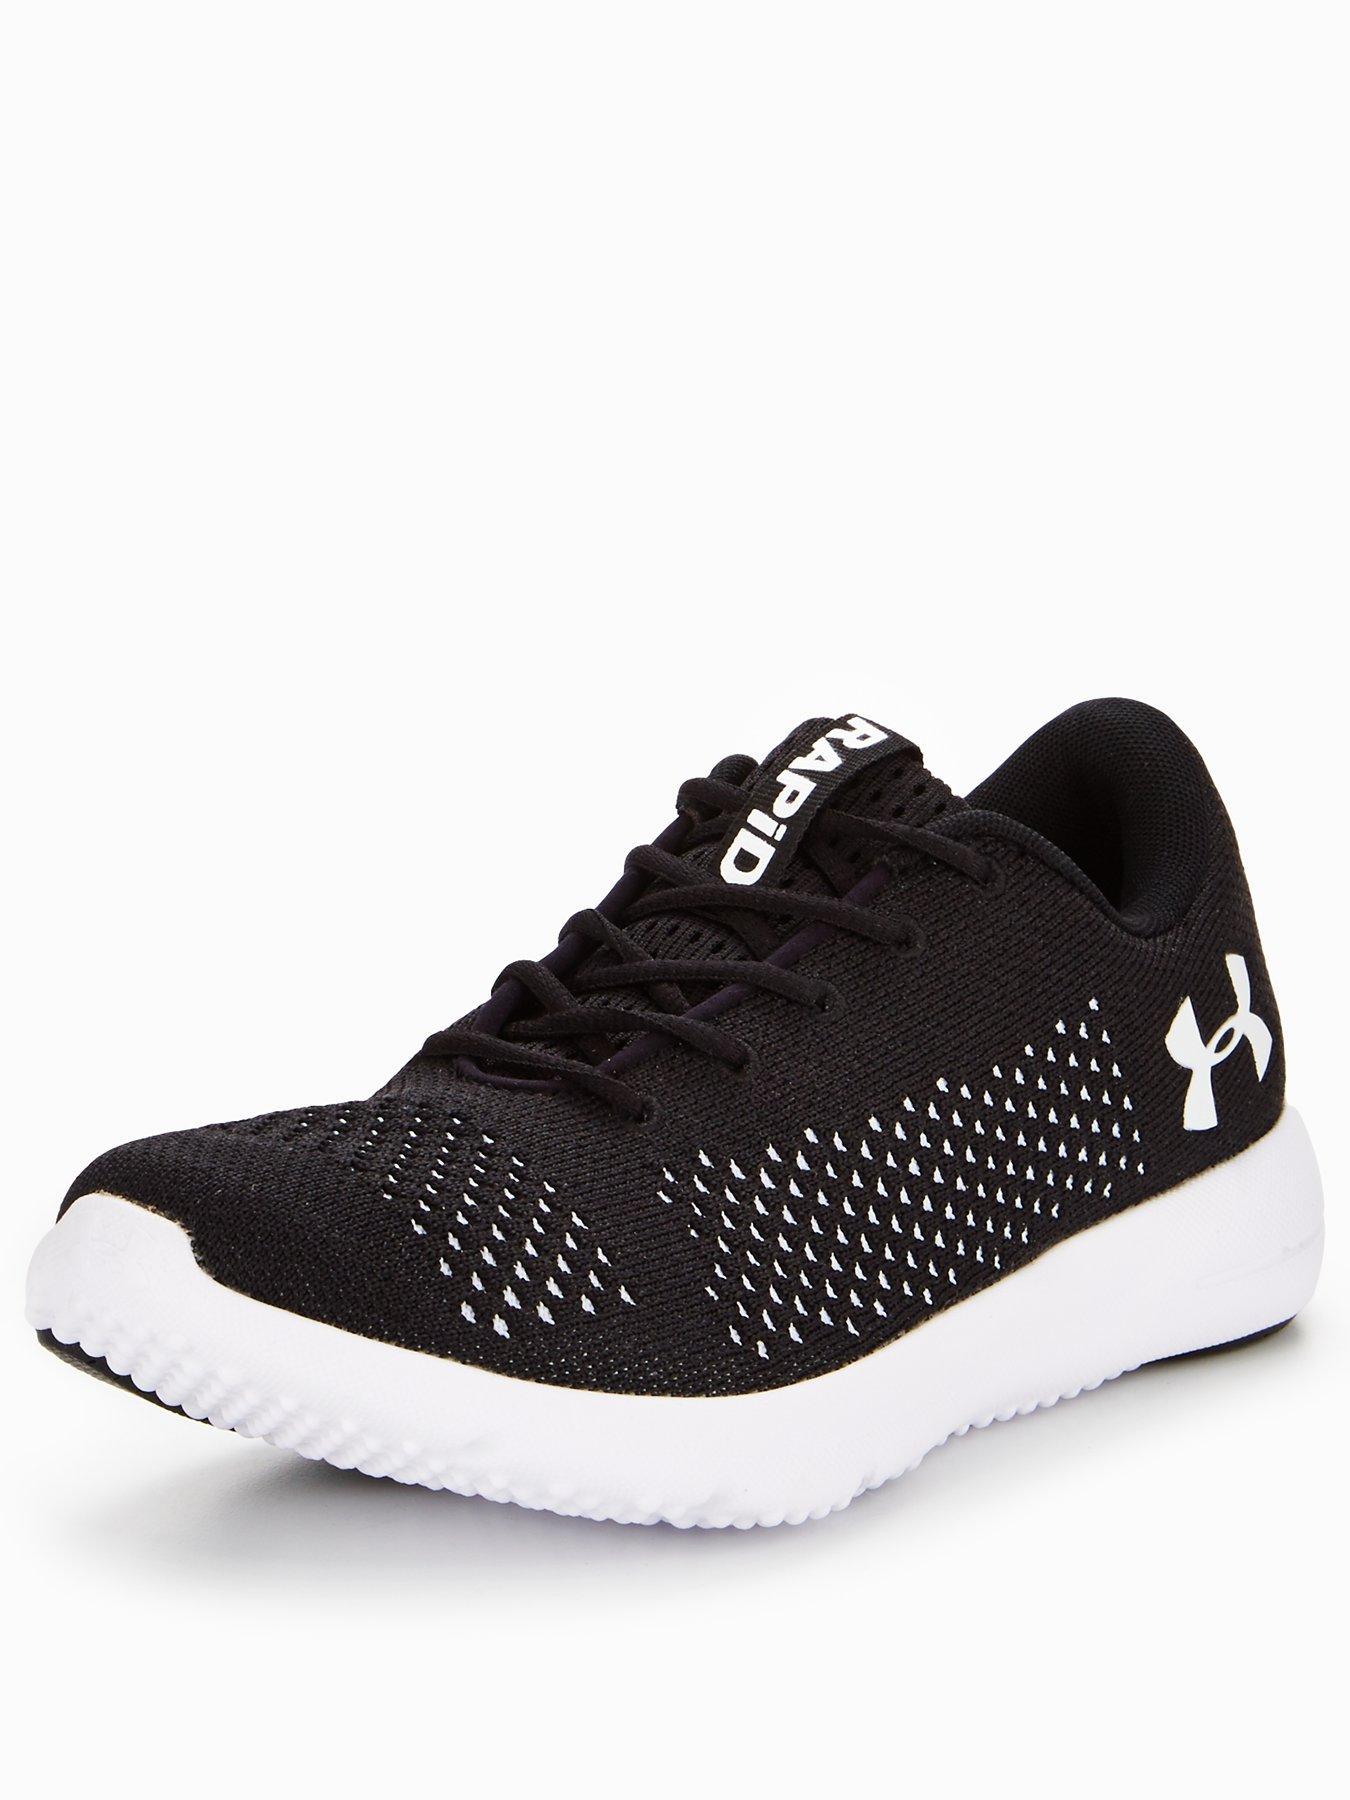 UNDER ARMOUR Rapid Black 1600172864 Women's Shoes UNDER ARMOUR Trainers